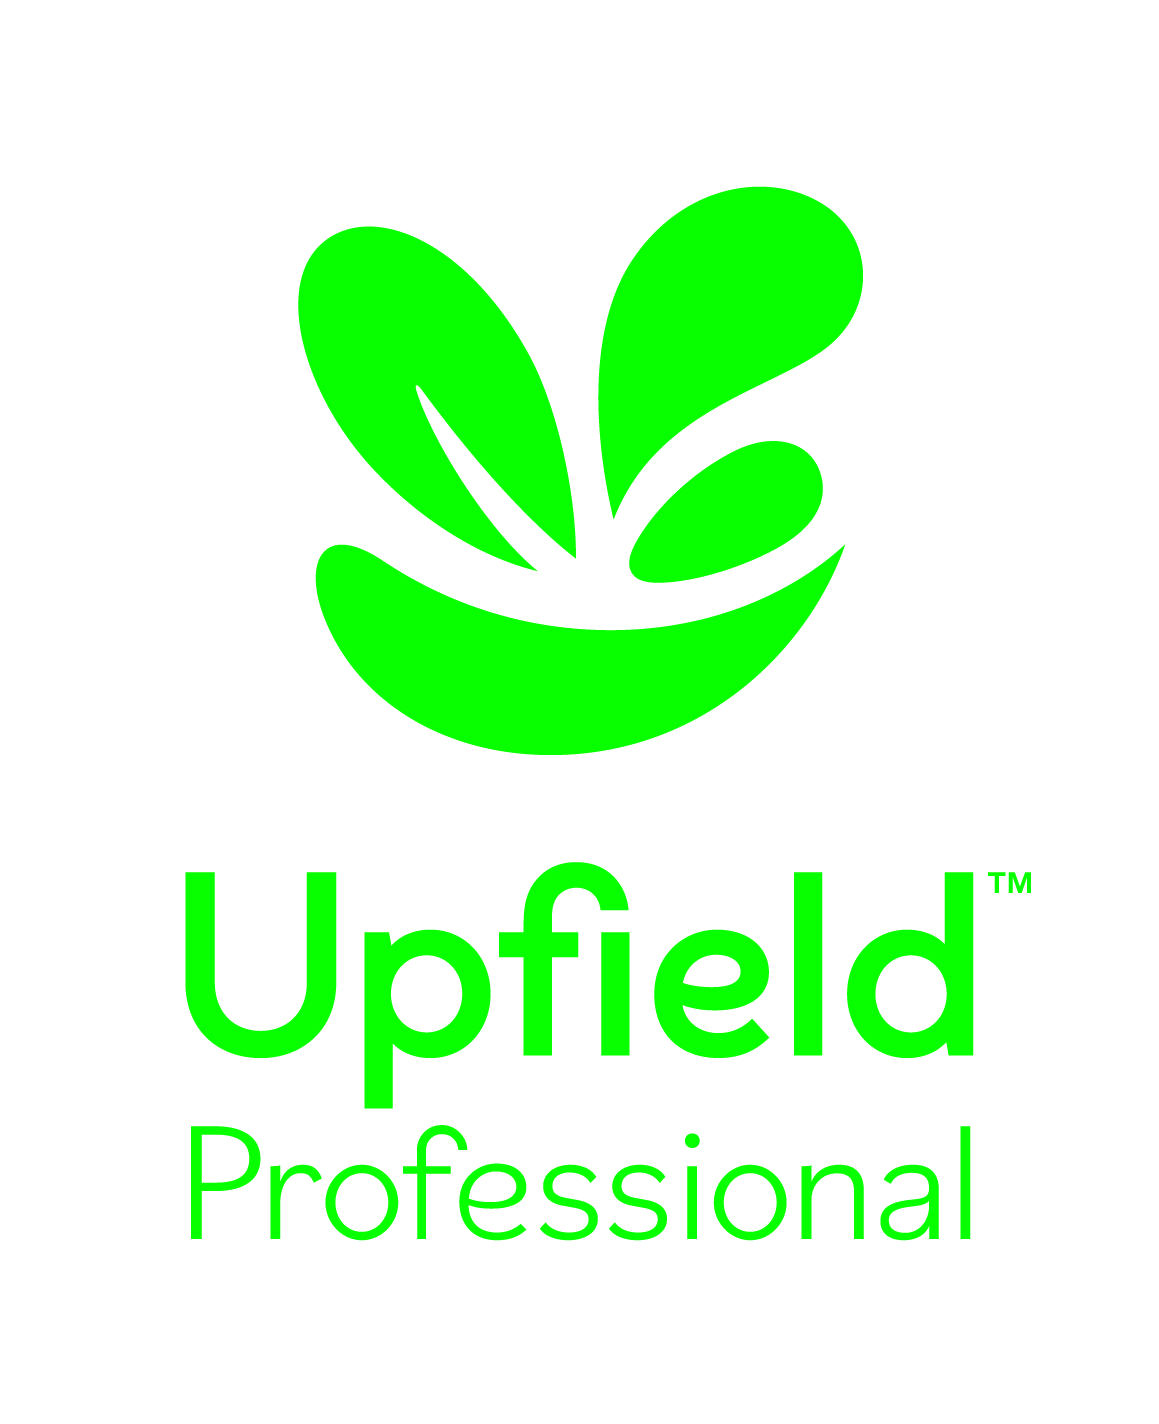 UPFIELD PROFESSIONAL